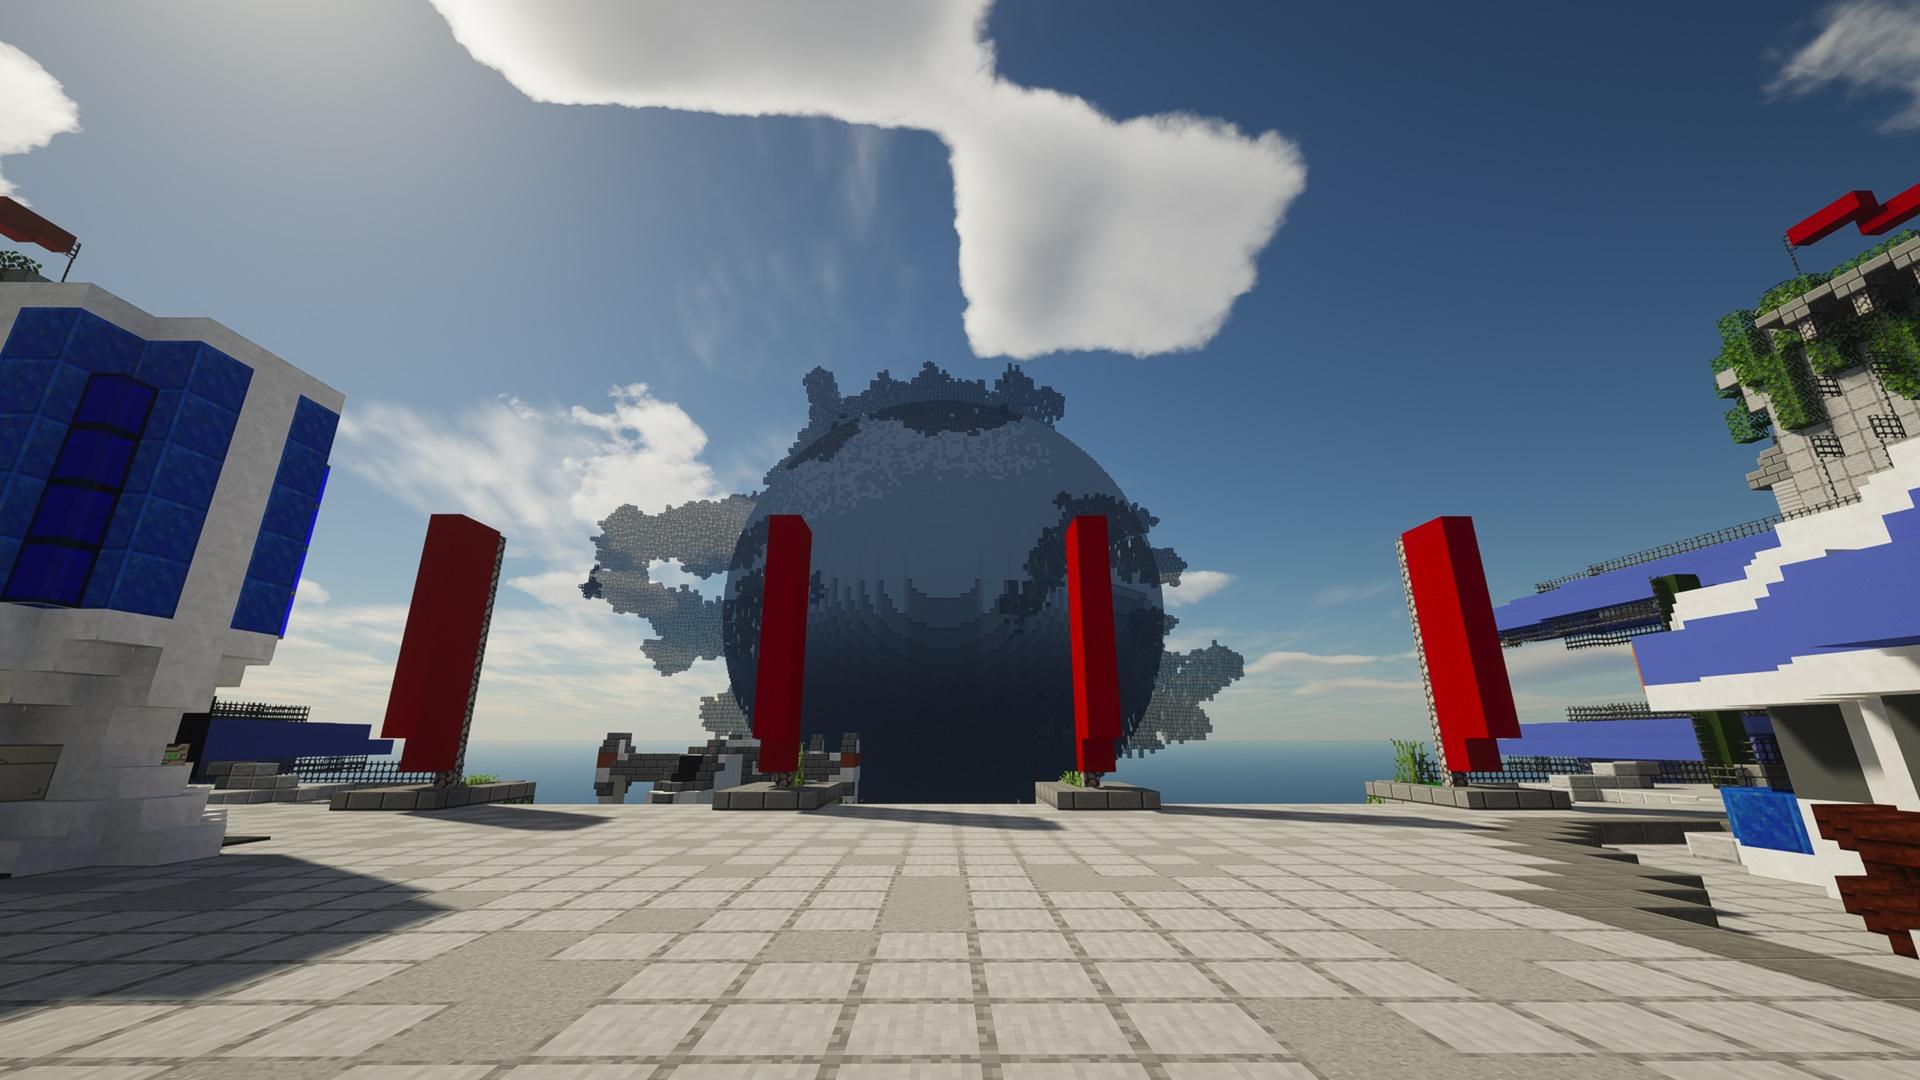 Minecraft players are recreating the original Destiny on PC